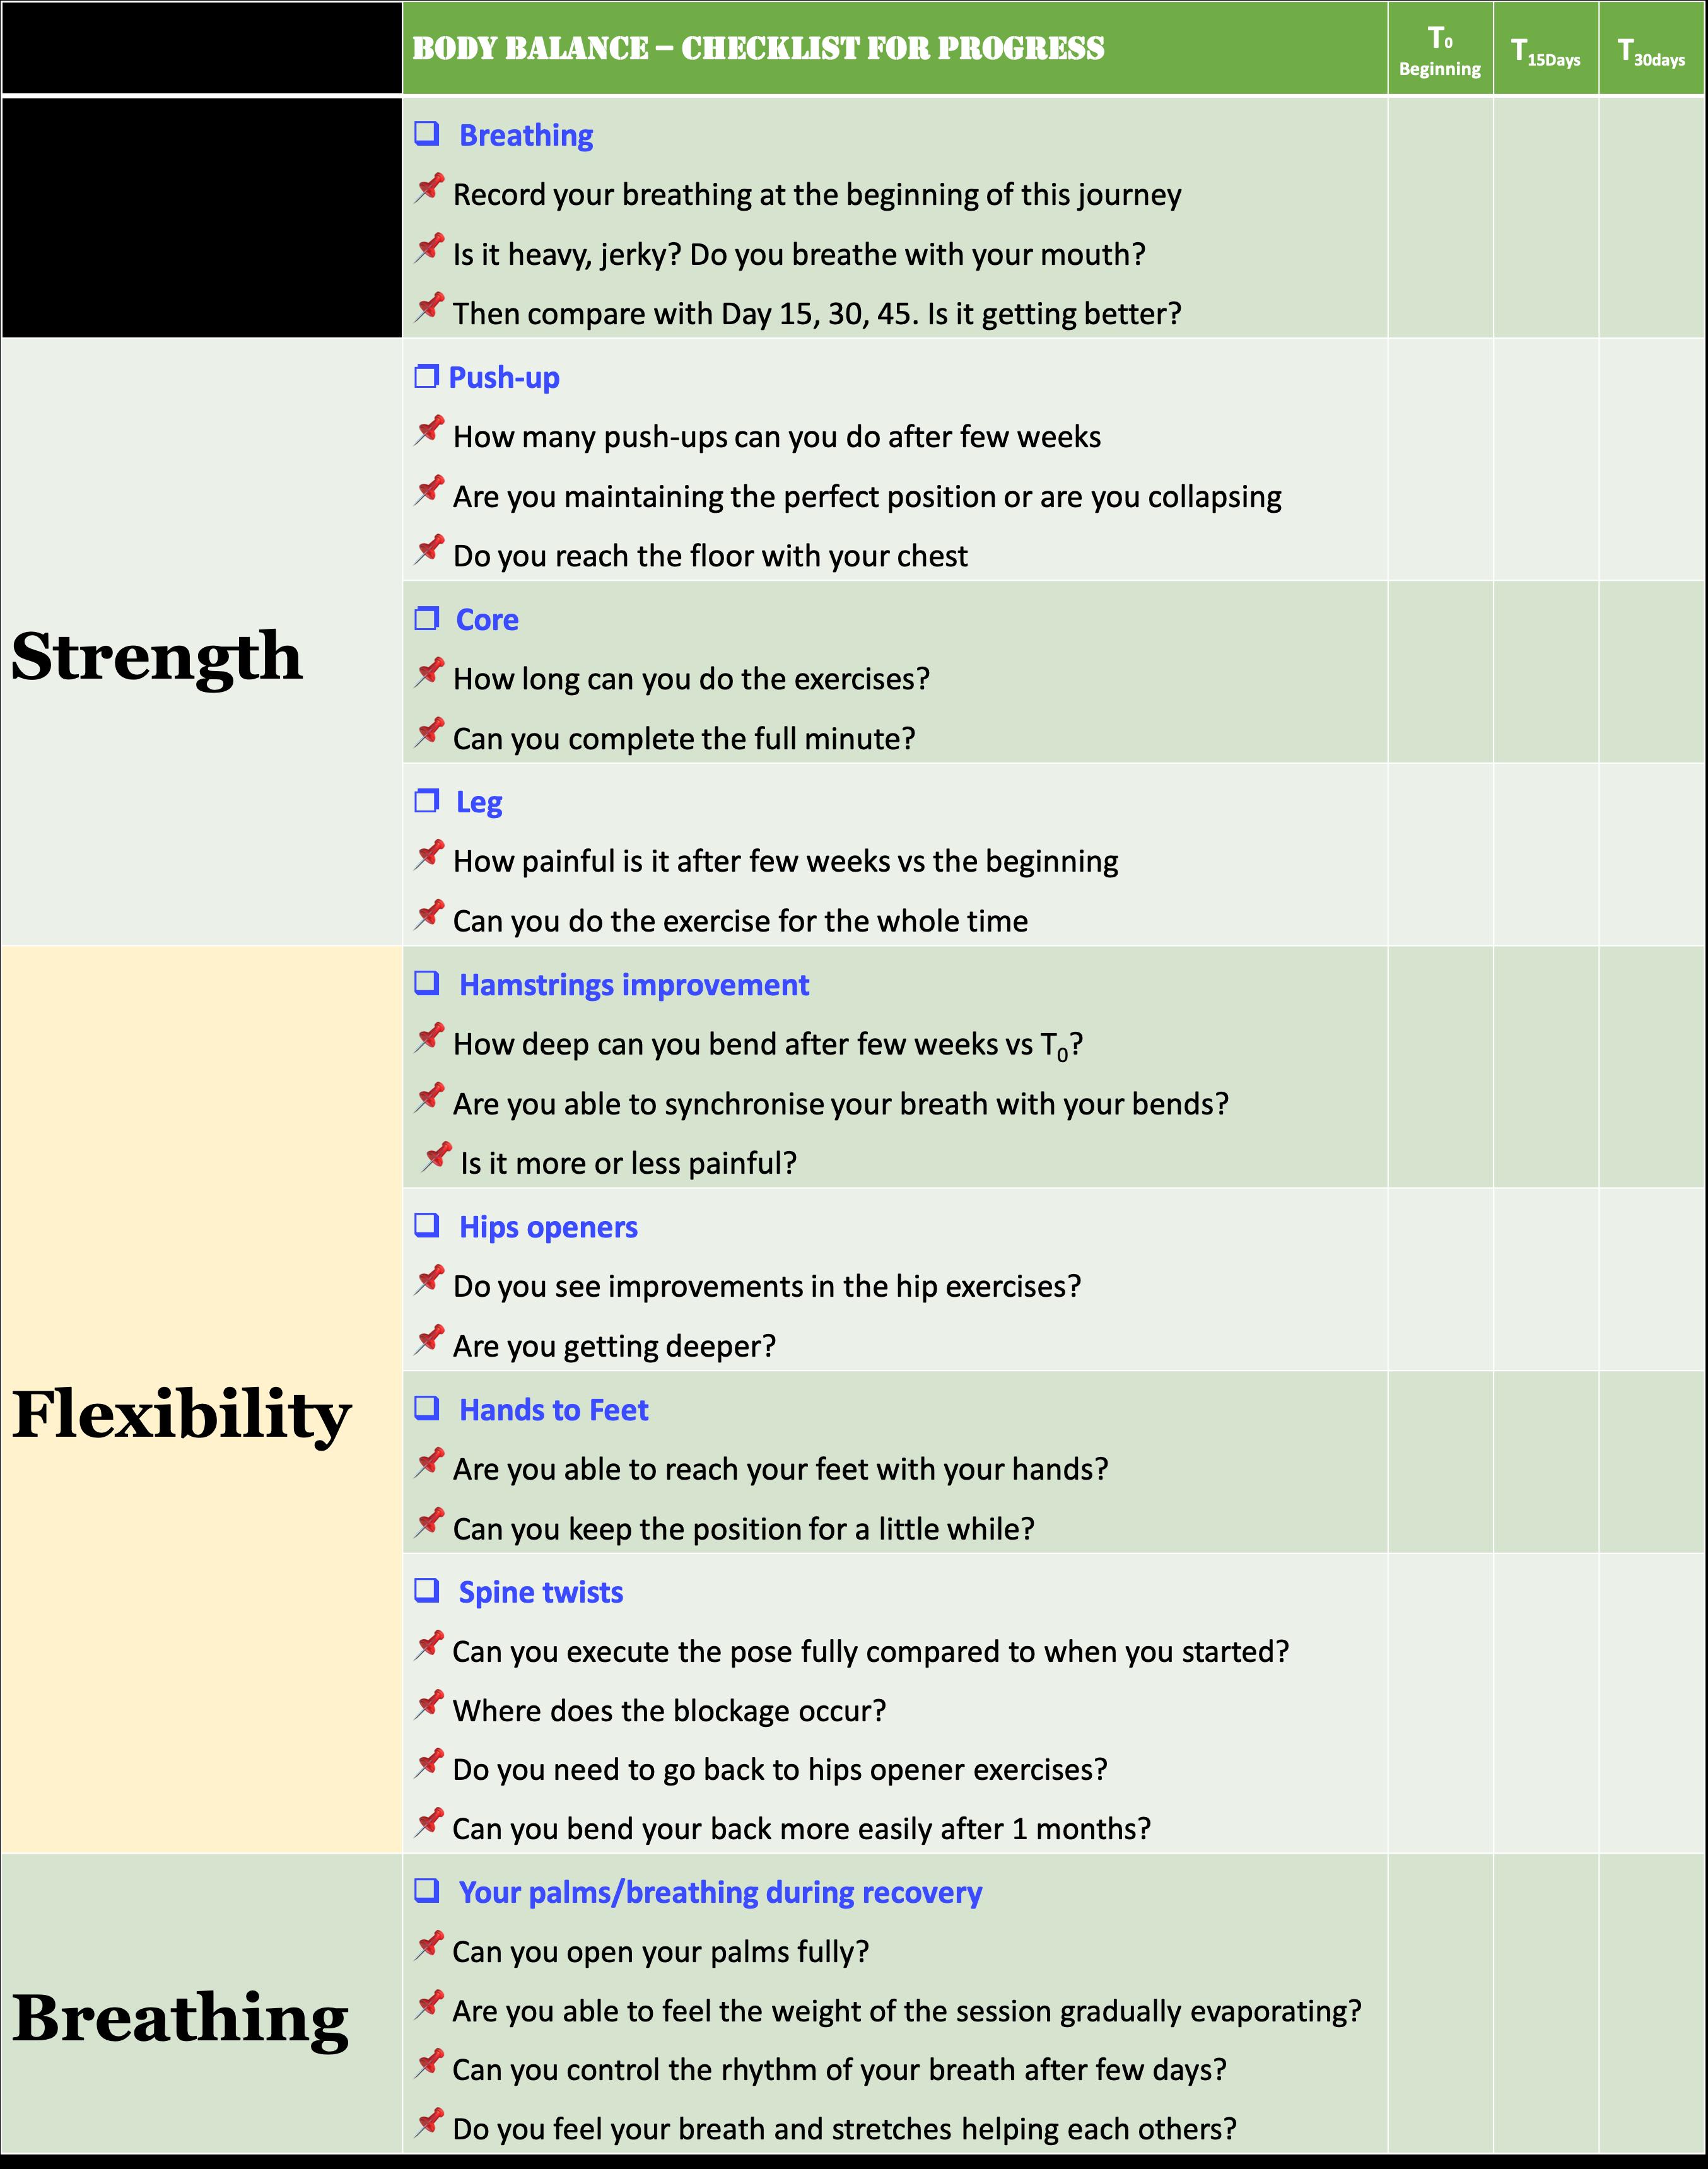 Body balance checklist to assess progress